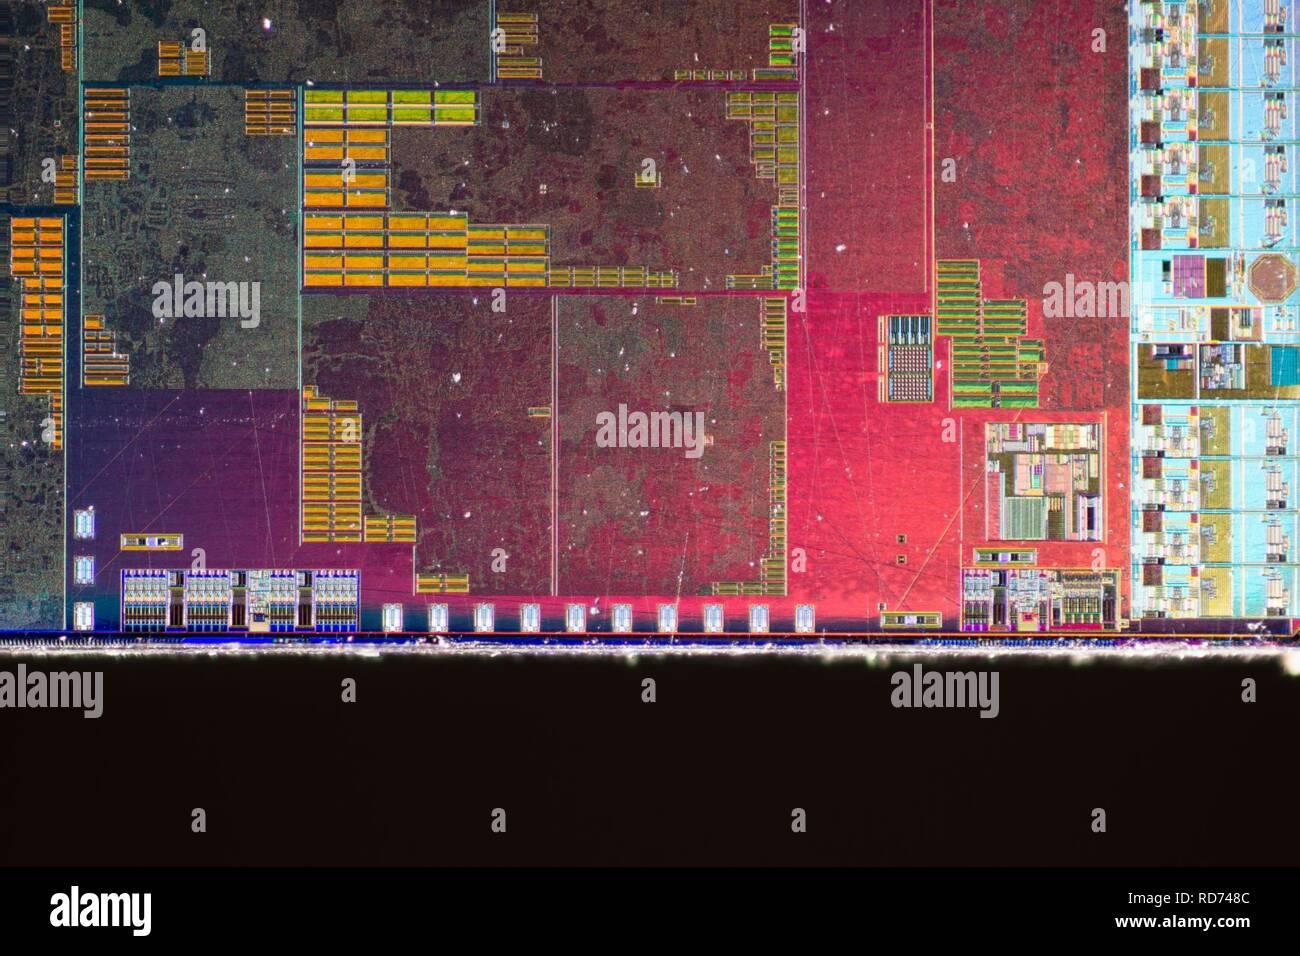 AMD@28nm@GCN 3th gen@Fiji@Radeon R9 Nano@SPMRC REA0356A-1539